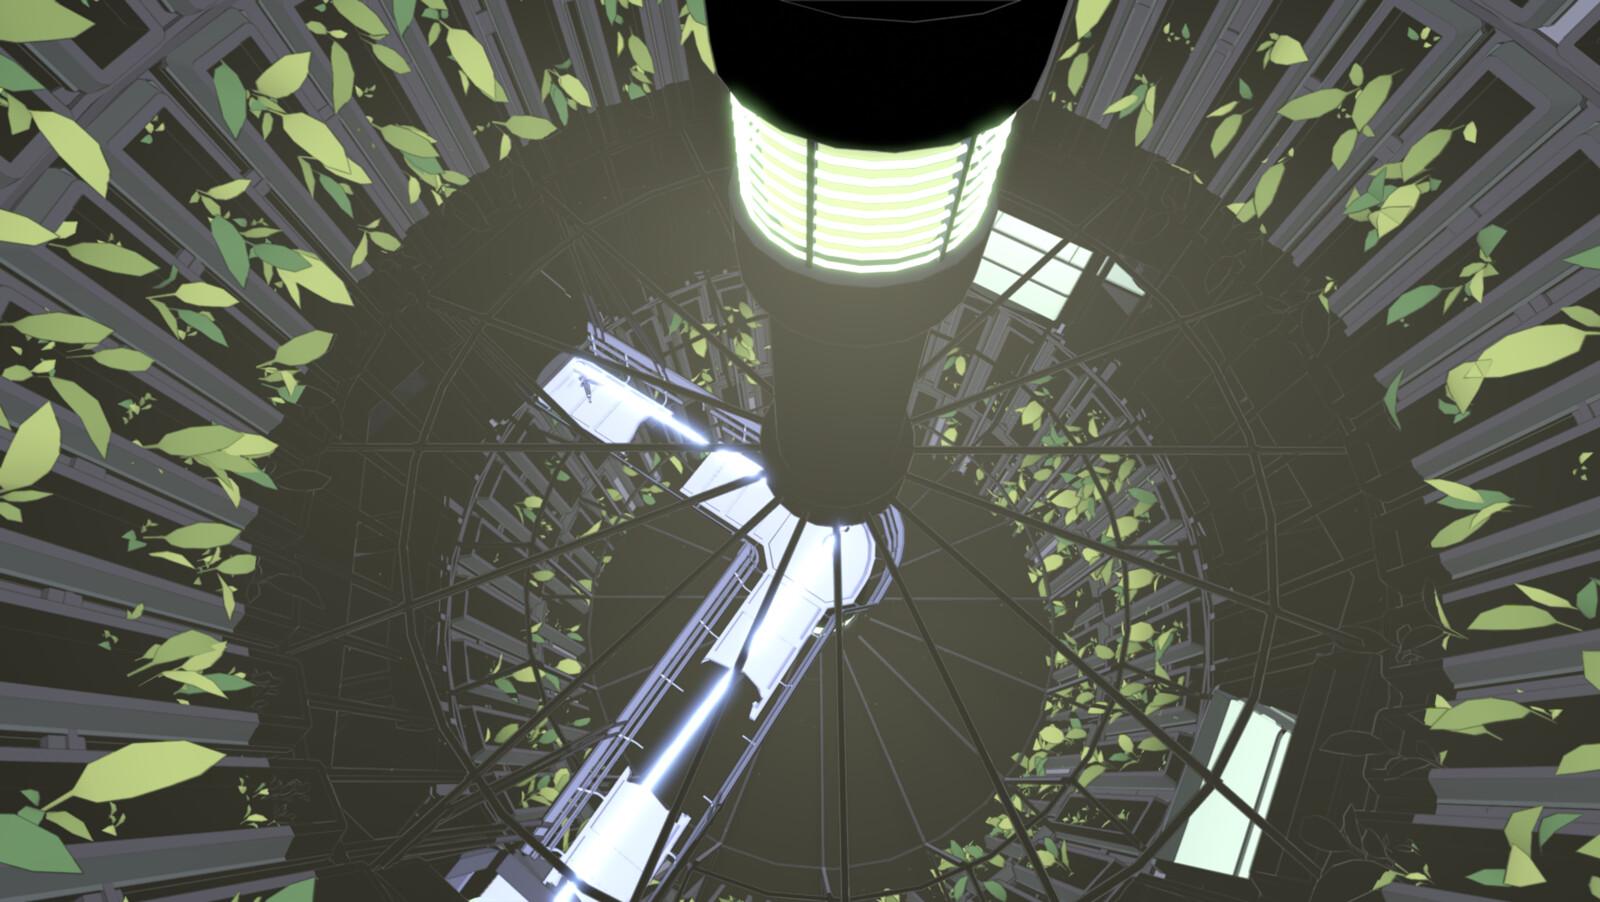 Hydroponics wheel in the plant area